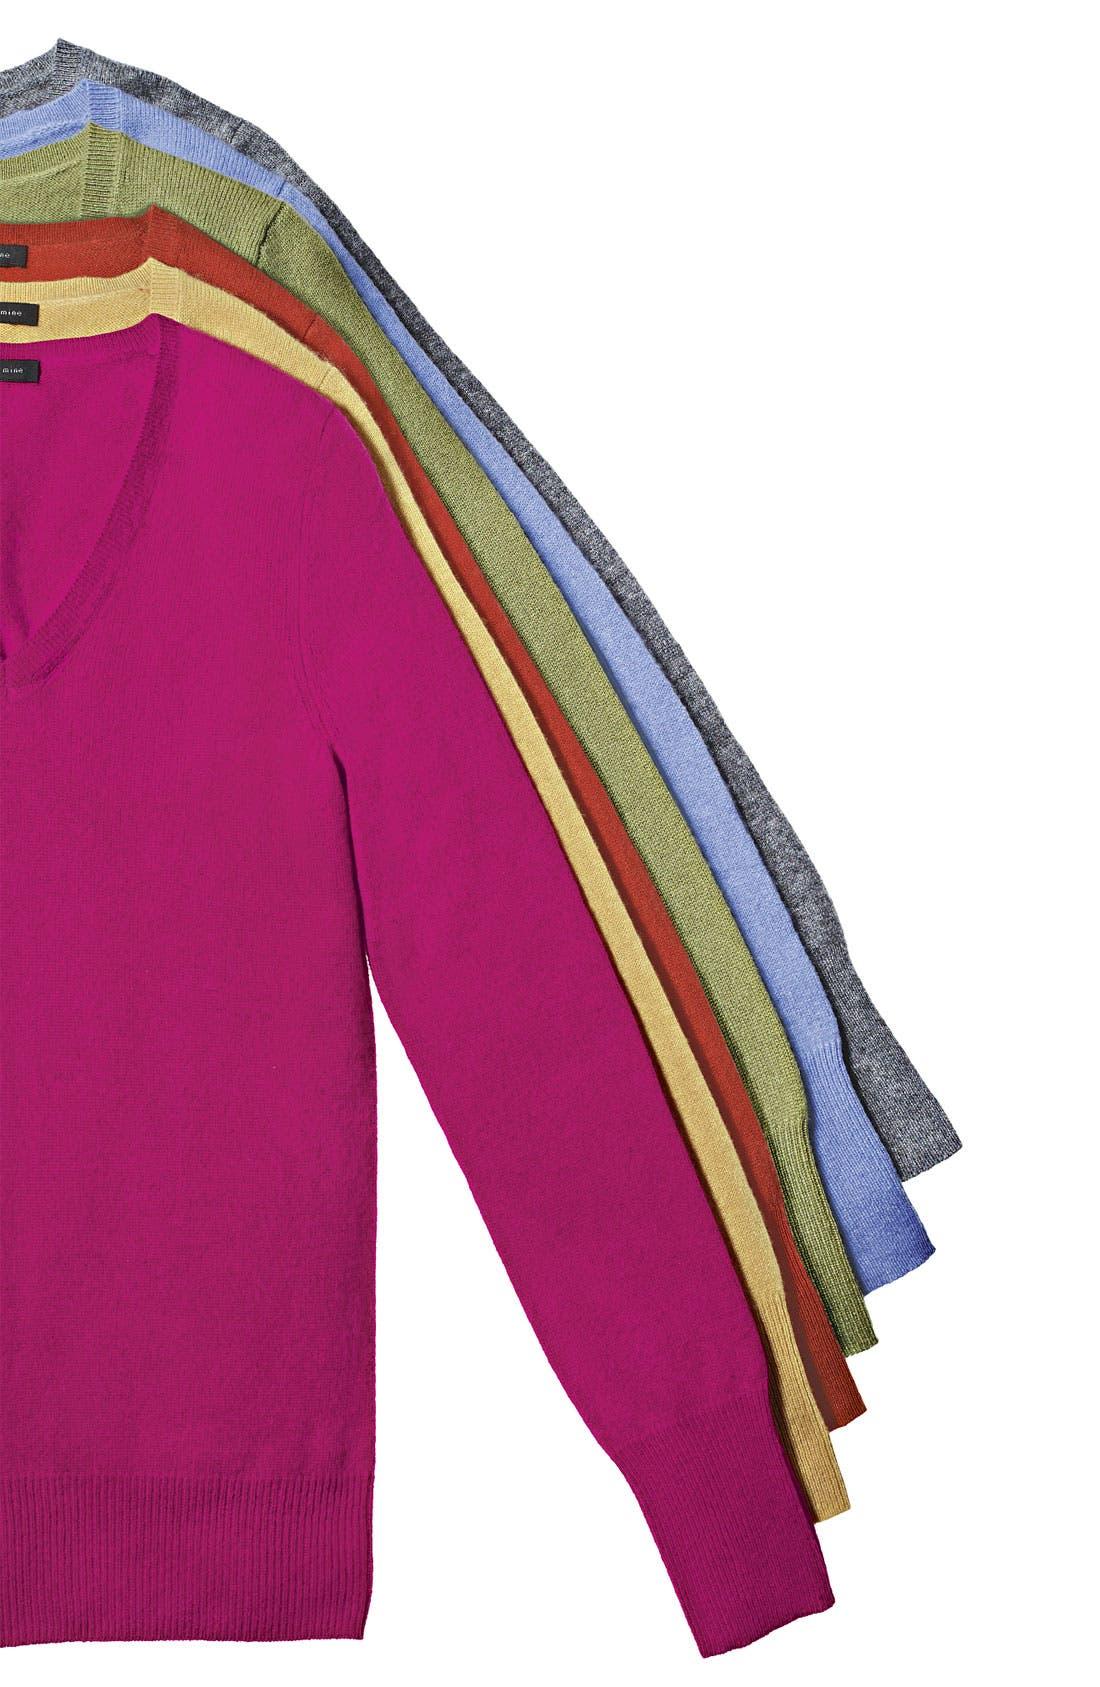 ONLY MINE,                             V-Neck Cashmere Sweater,                             Alternate thumbnail 2, color,                             336